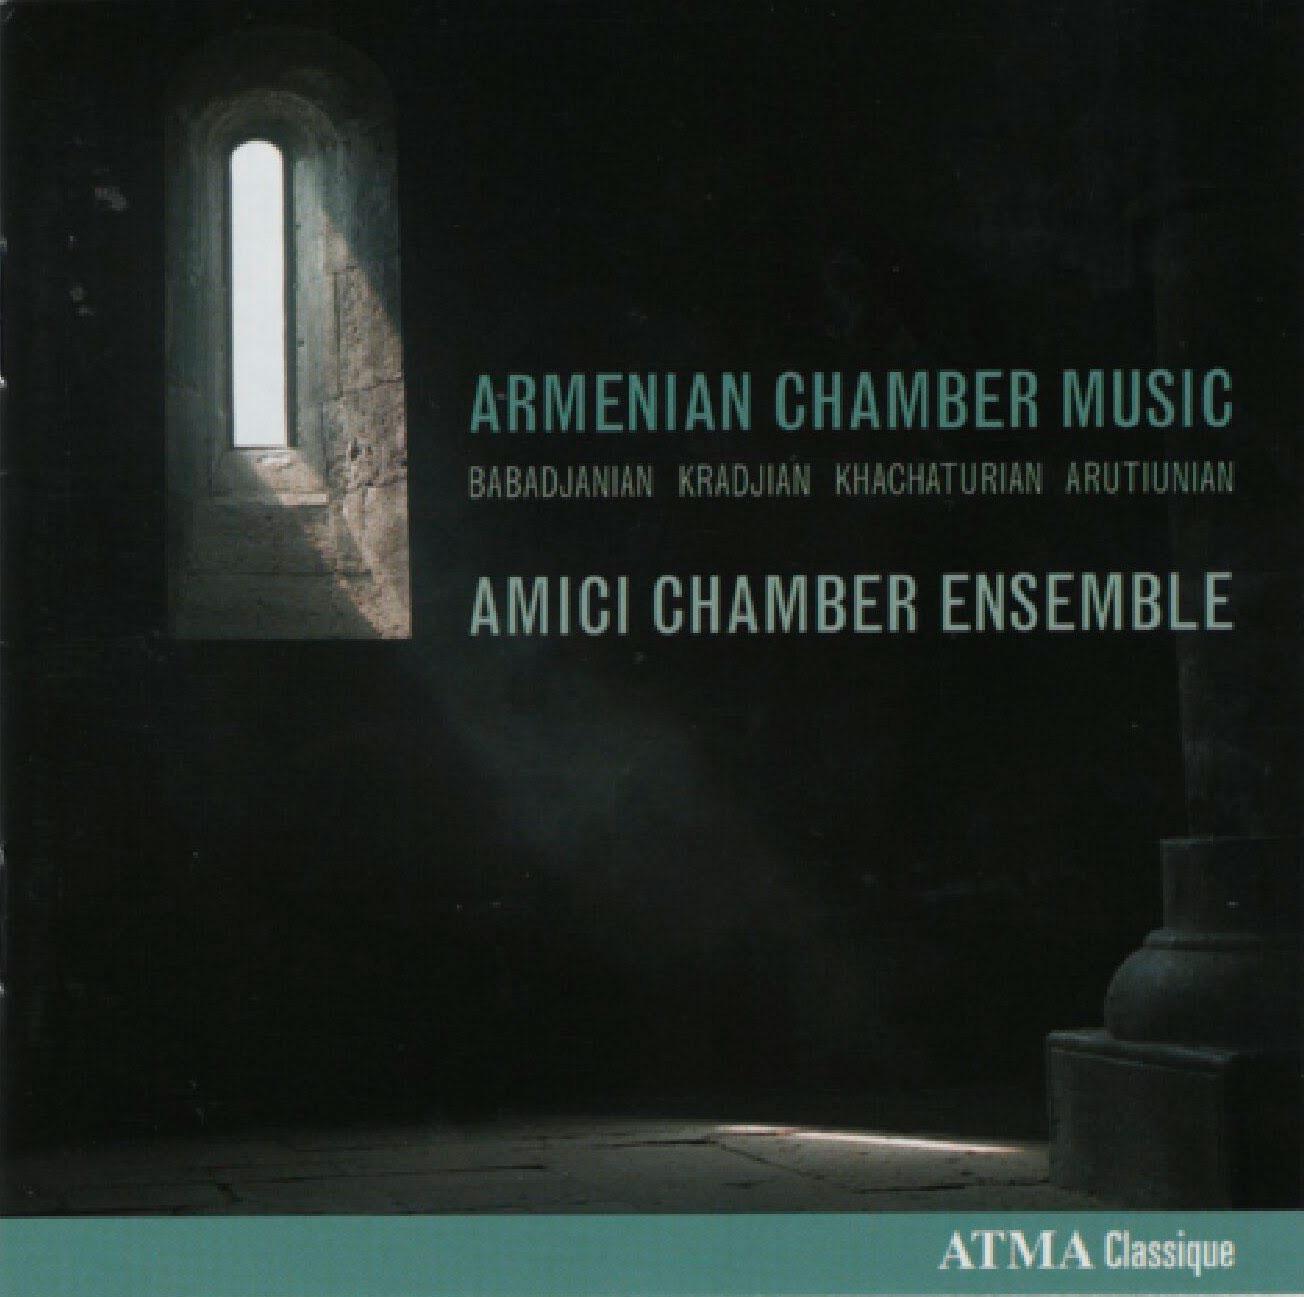 armenian chamber music cd cover